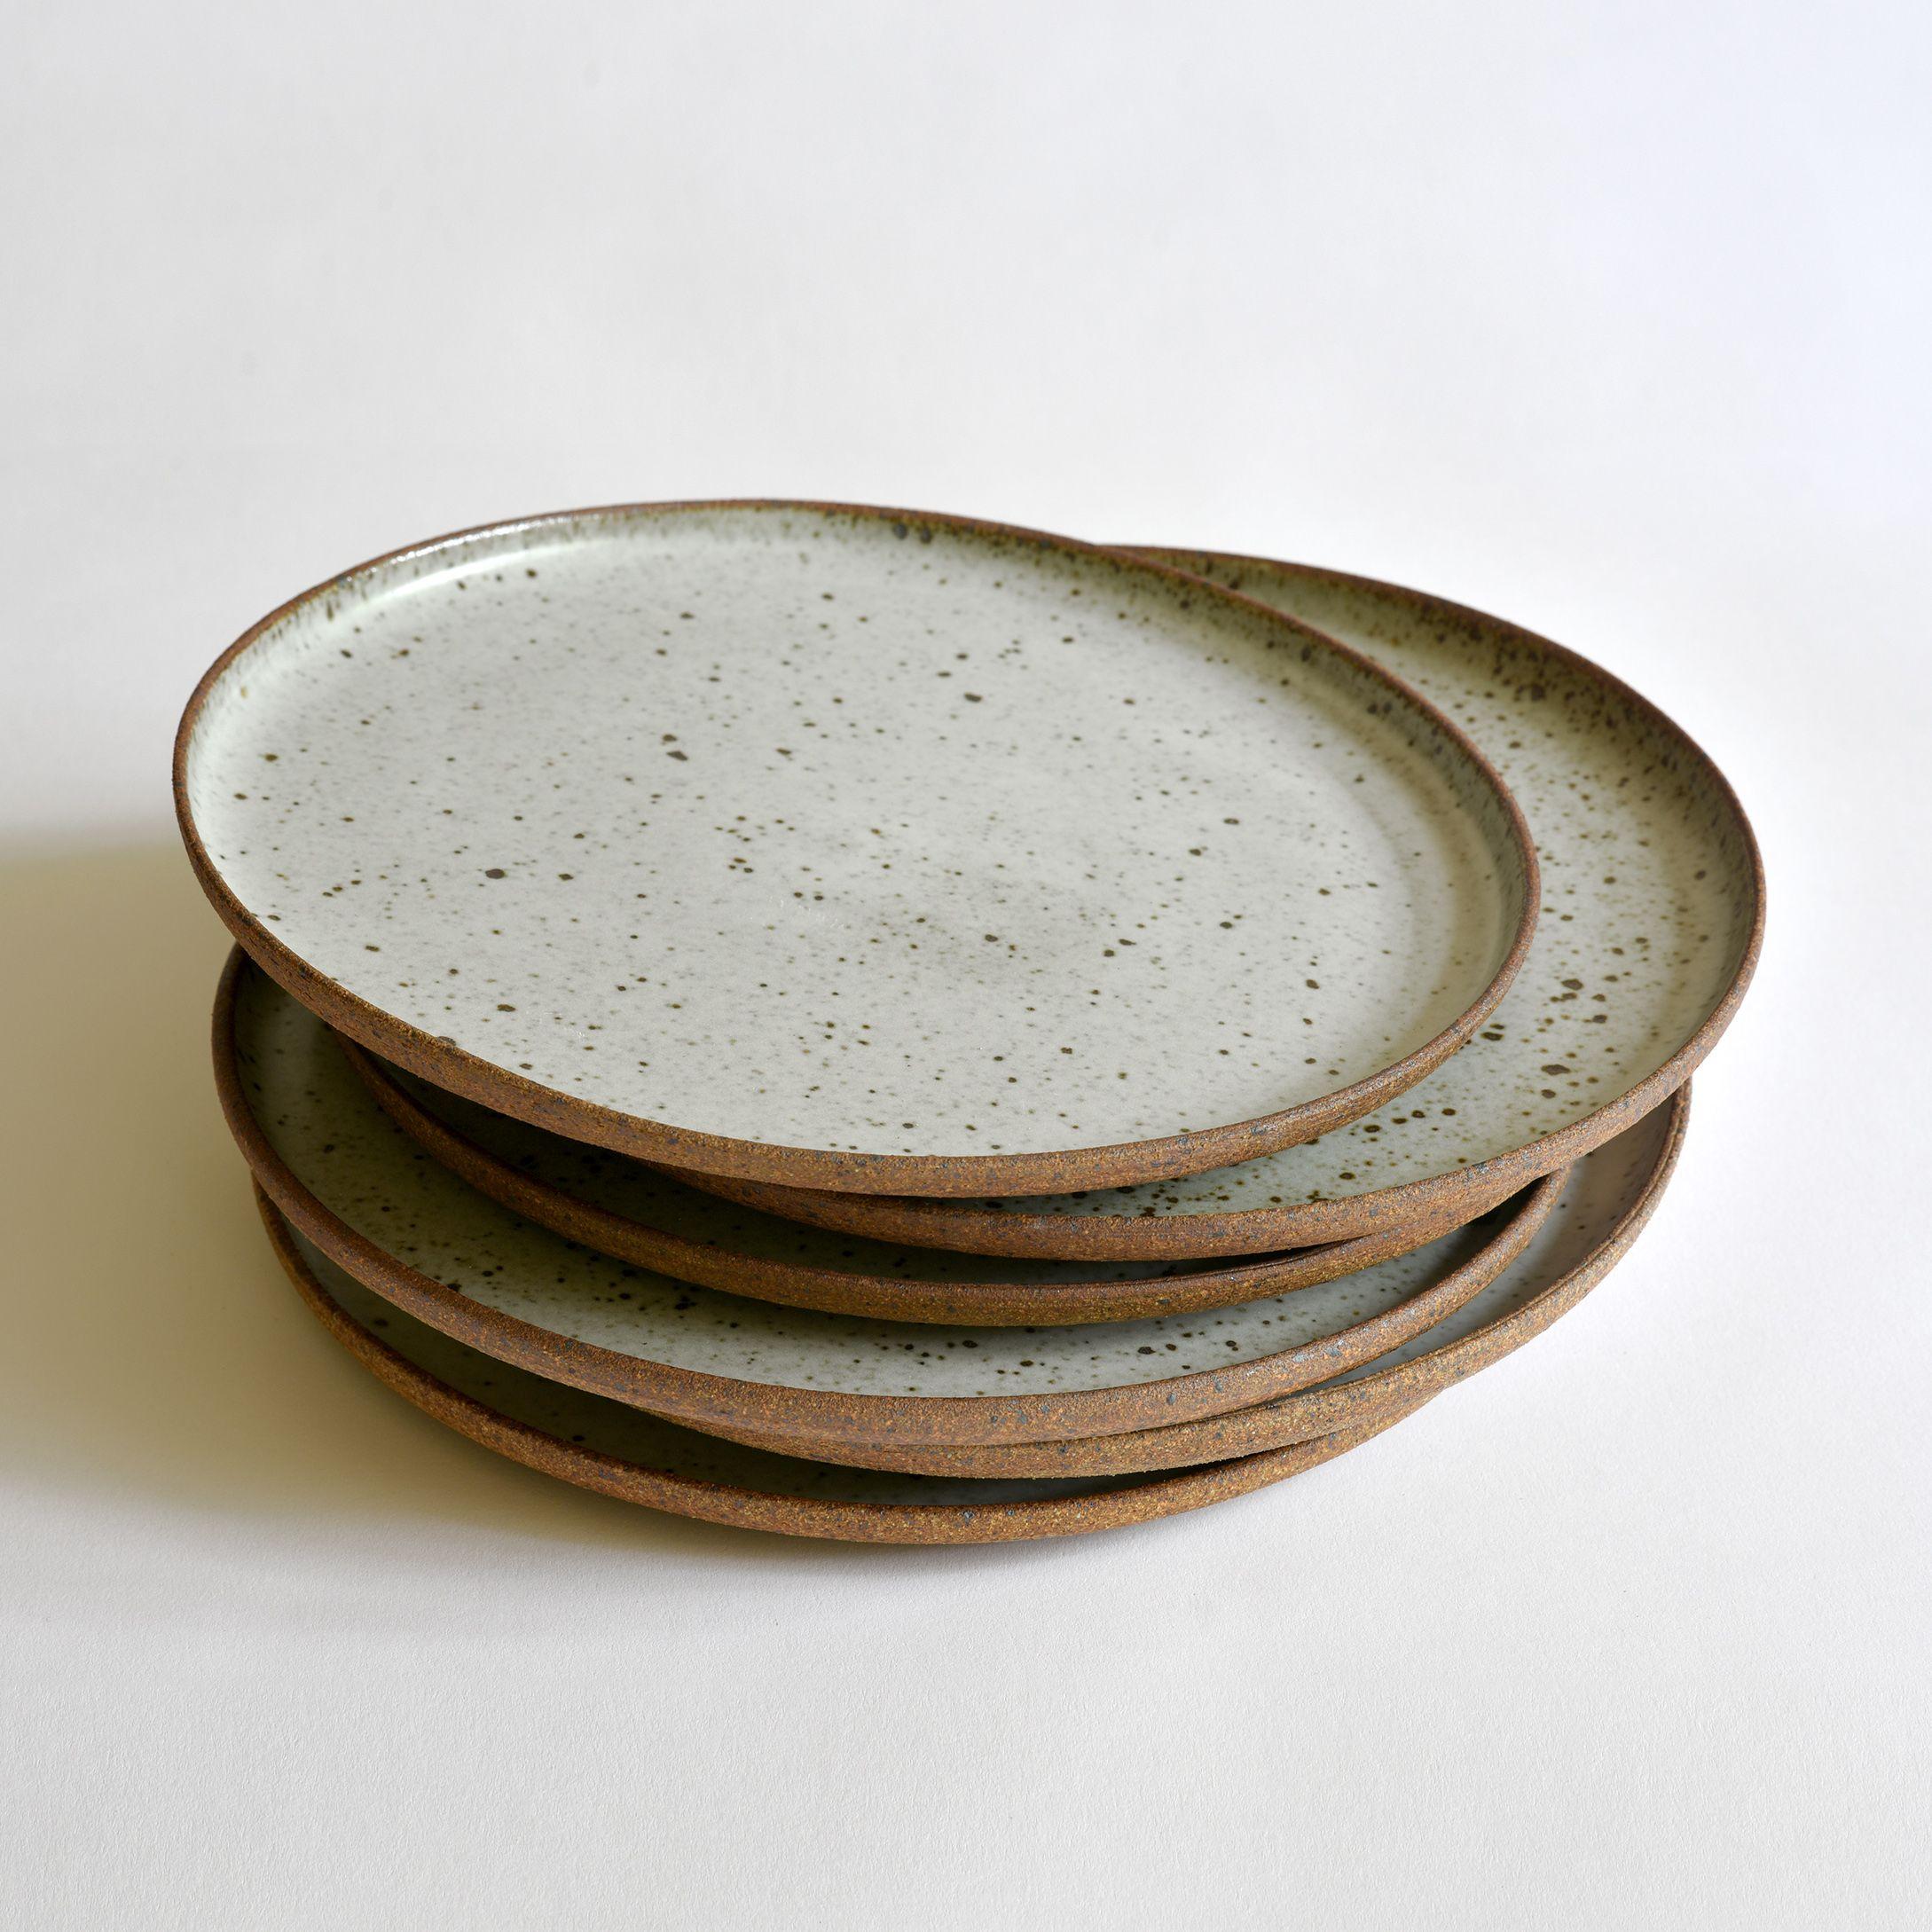 Ceramic dinner plate Large plate Handmade plates Housewarming gift Ceramic plate Unique dinnerware Wedding gift Handmade dinnerware